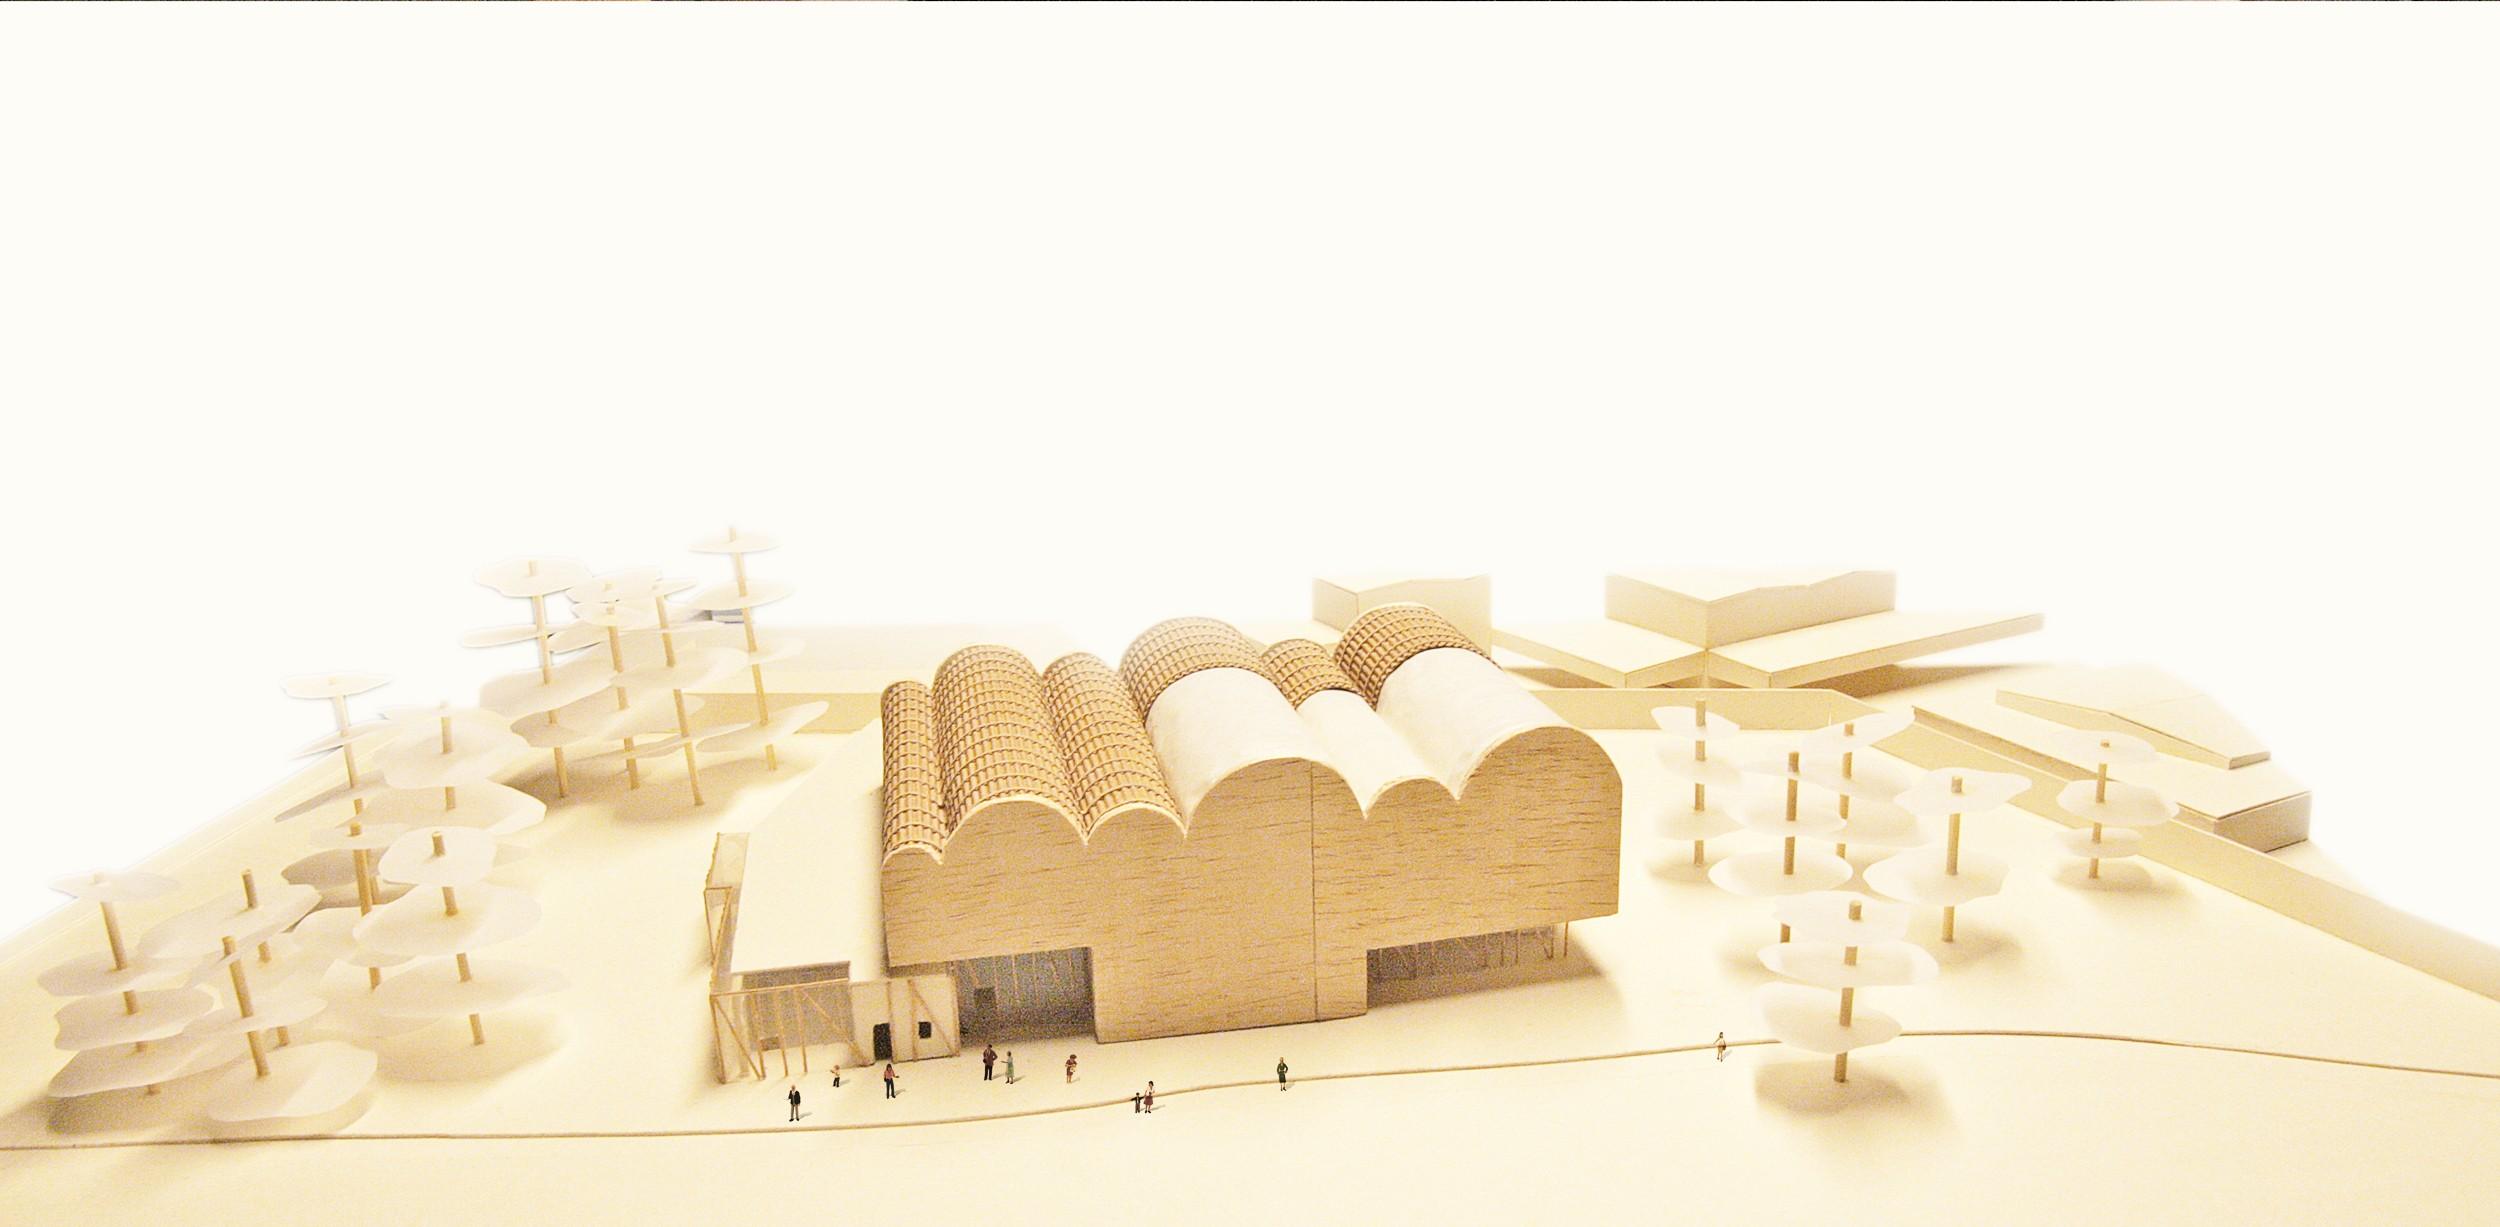 Studi Di Architettura Cuneo blaarchitettura | linkedin